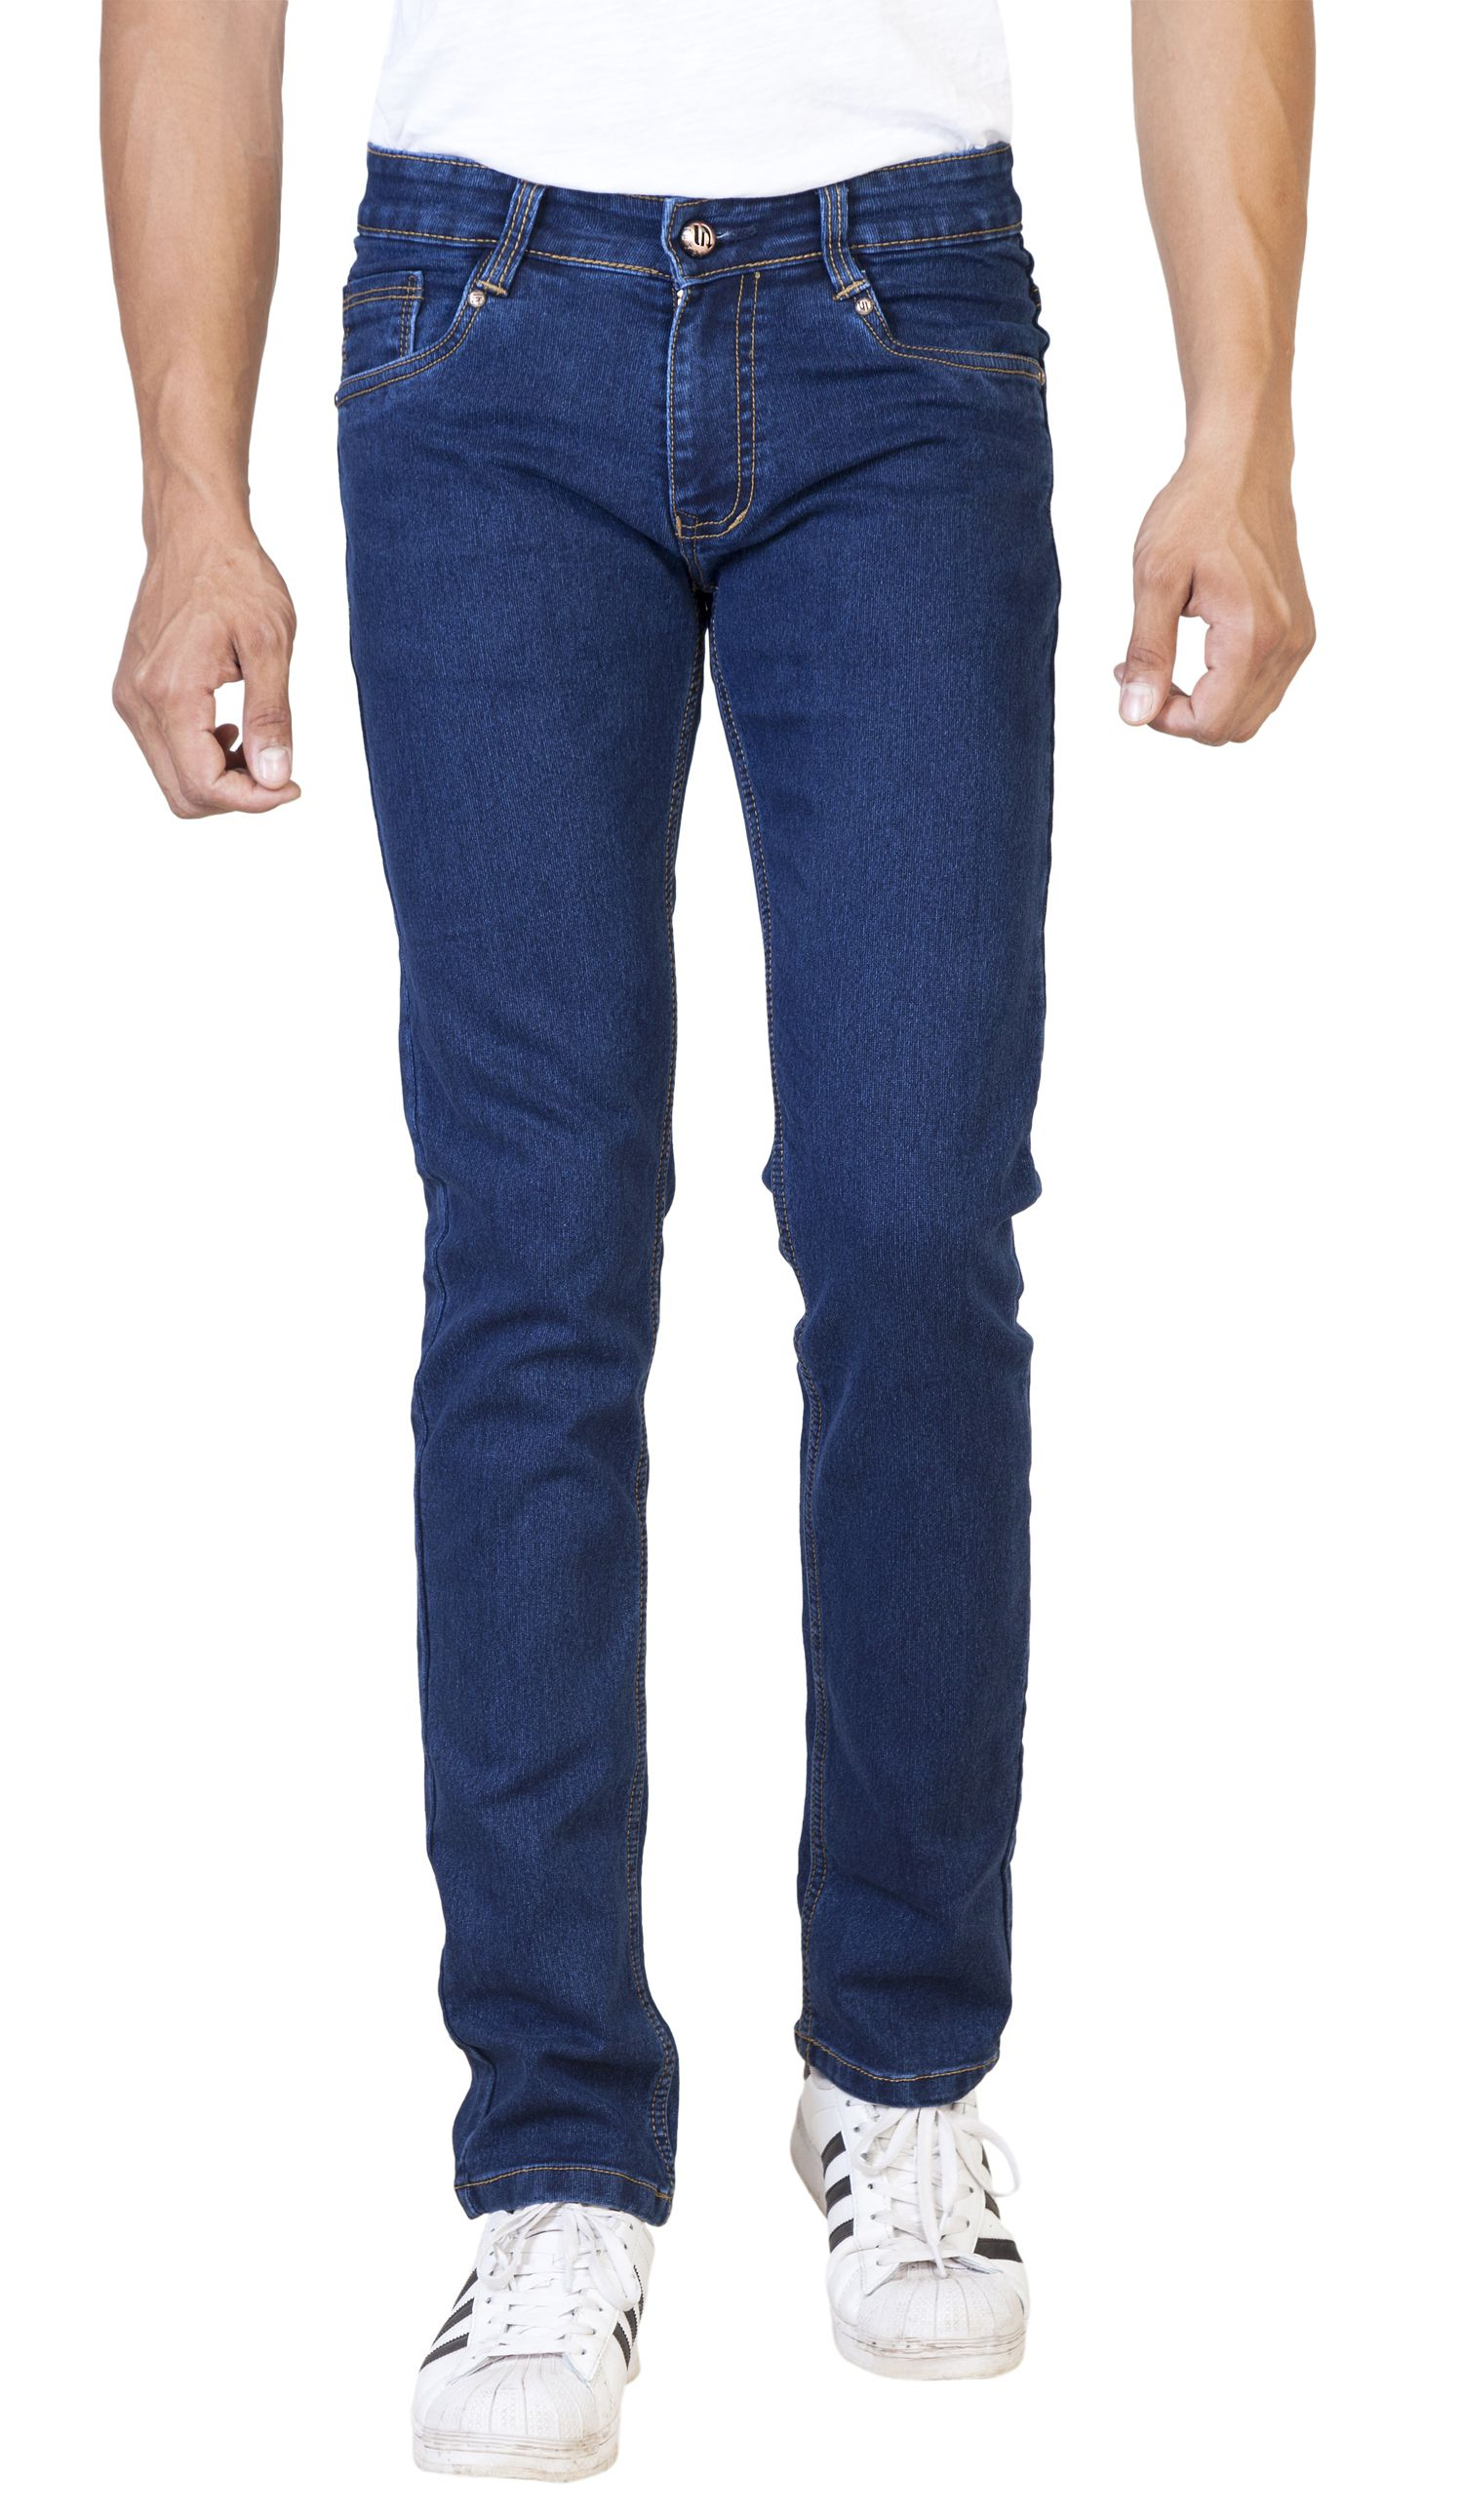 ROAD ROCKERS Blue Slim Jeans